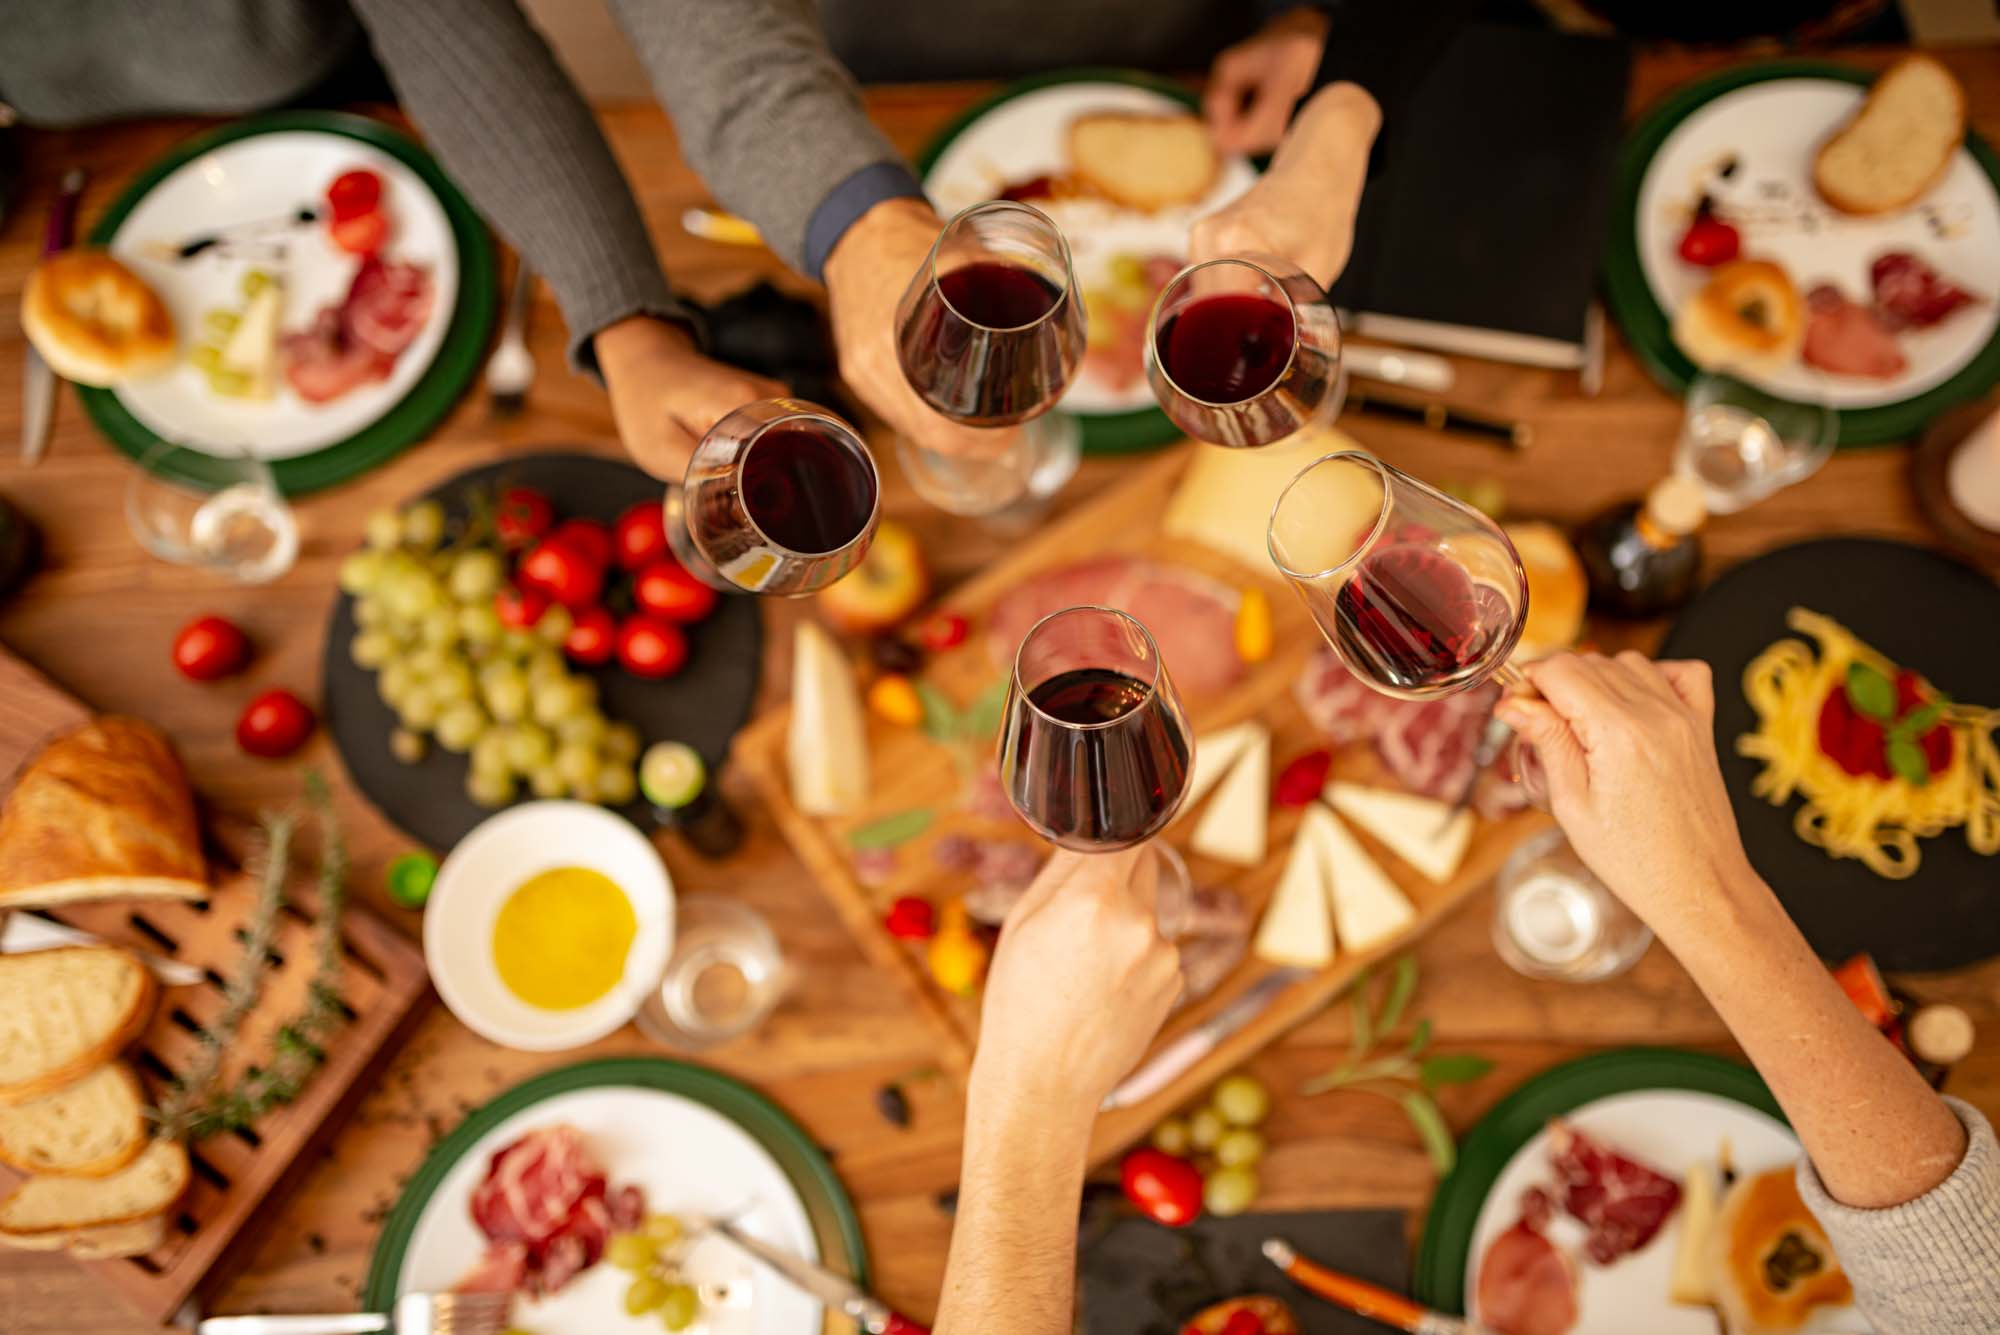 Cucina Amatoriale Formazione Manageriale a Roma